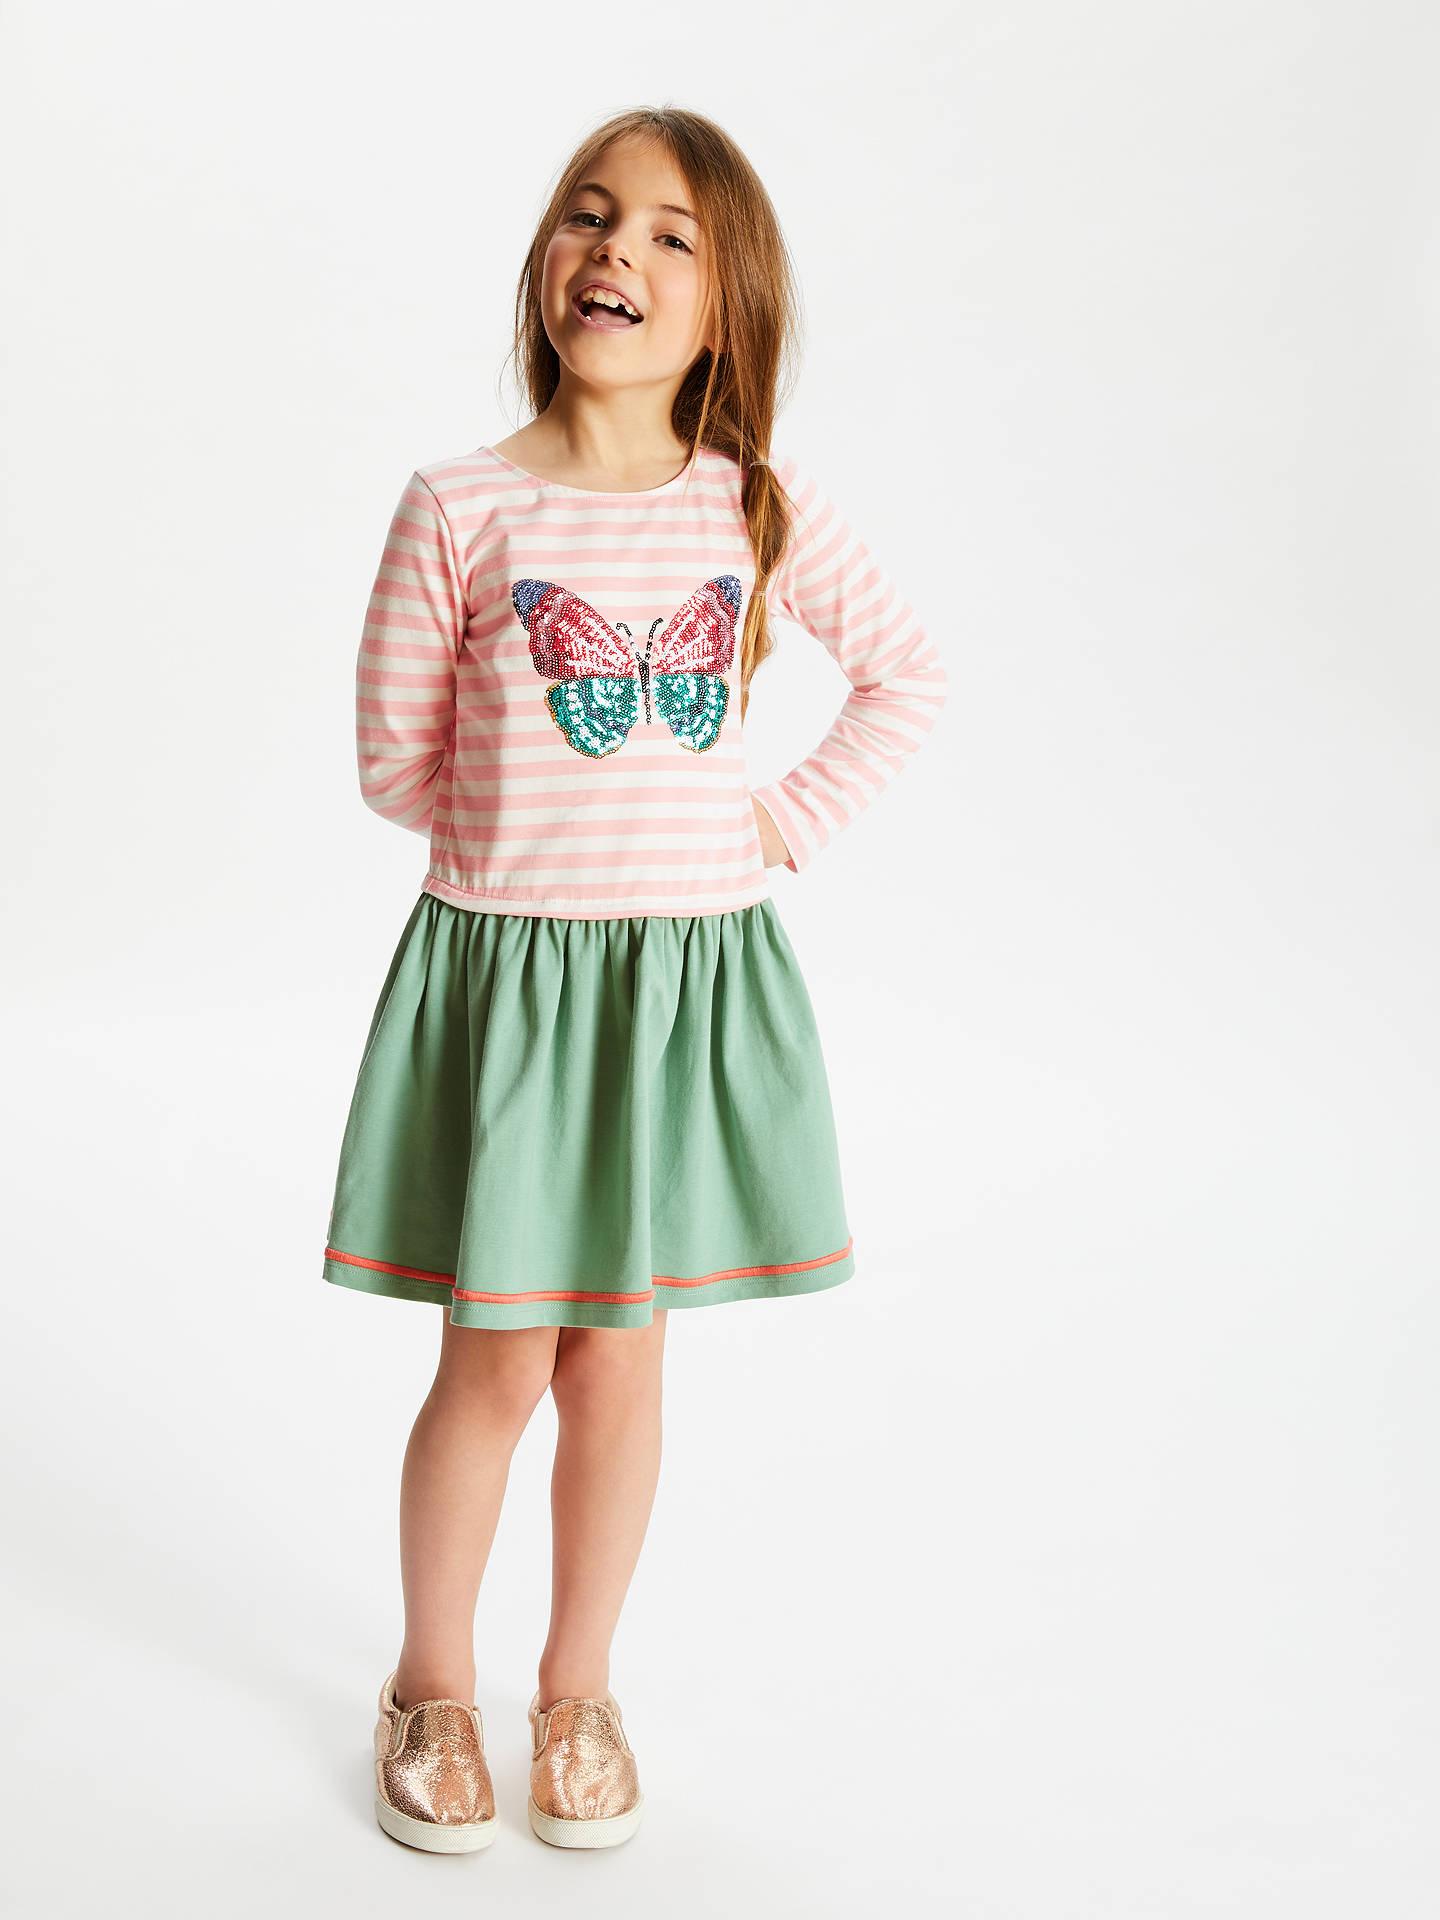 612b7fcbf8 Buy John Lewis & Partner Girls' Butterfly Sequin Dress, Pink/Green, 12 ...